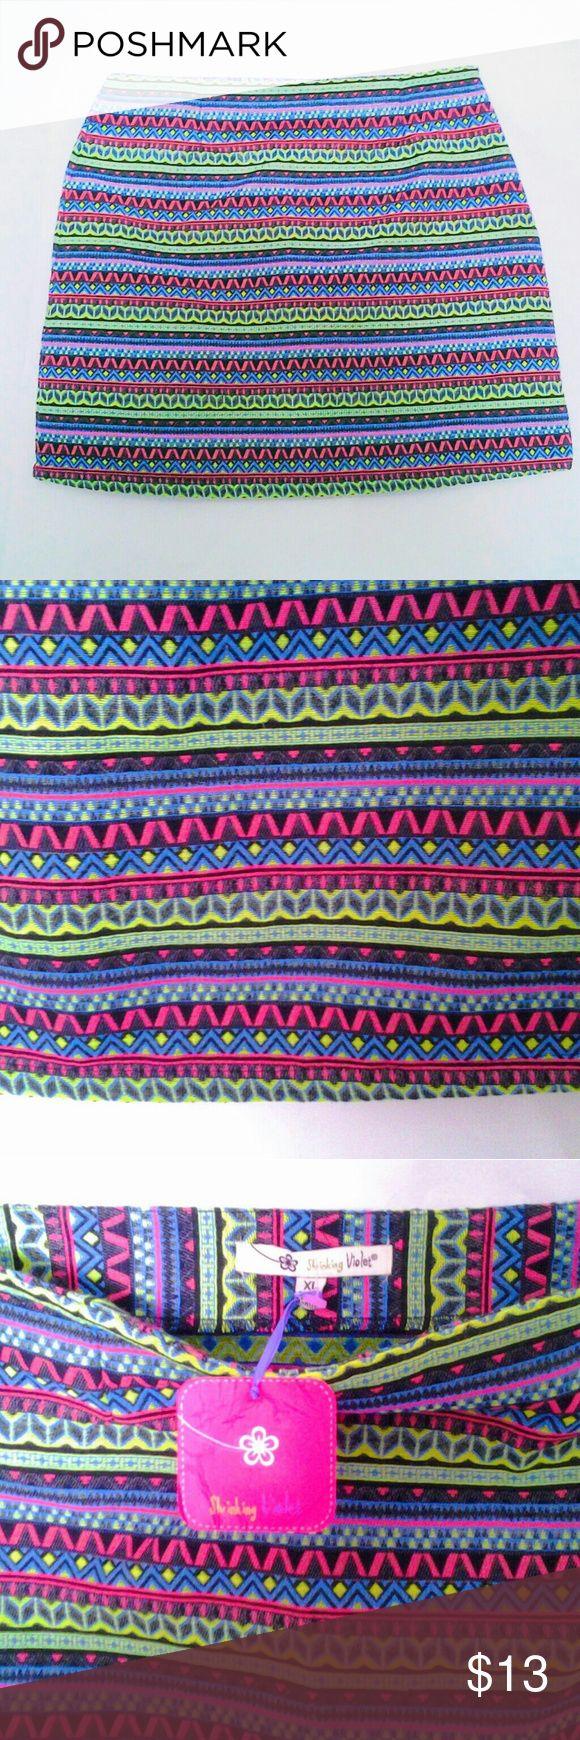 "Aztec Print Skirt size XL 100% cotton New 33"" waist, 42"" hips, 17.5"" length. Side zipper. Skrinking Violet Skirts Mini"